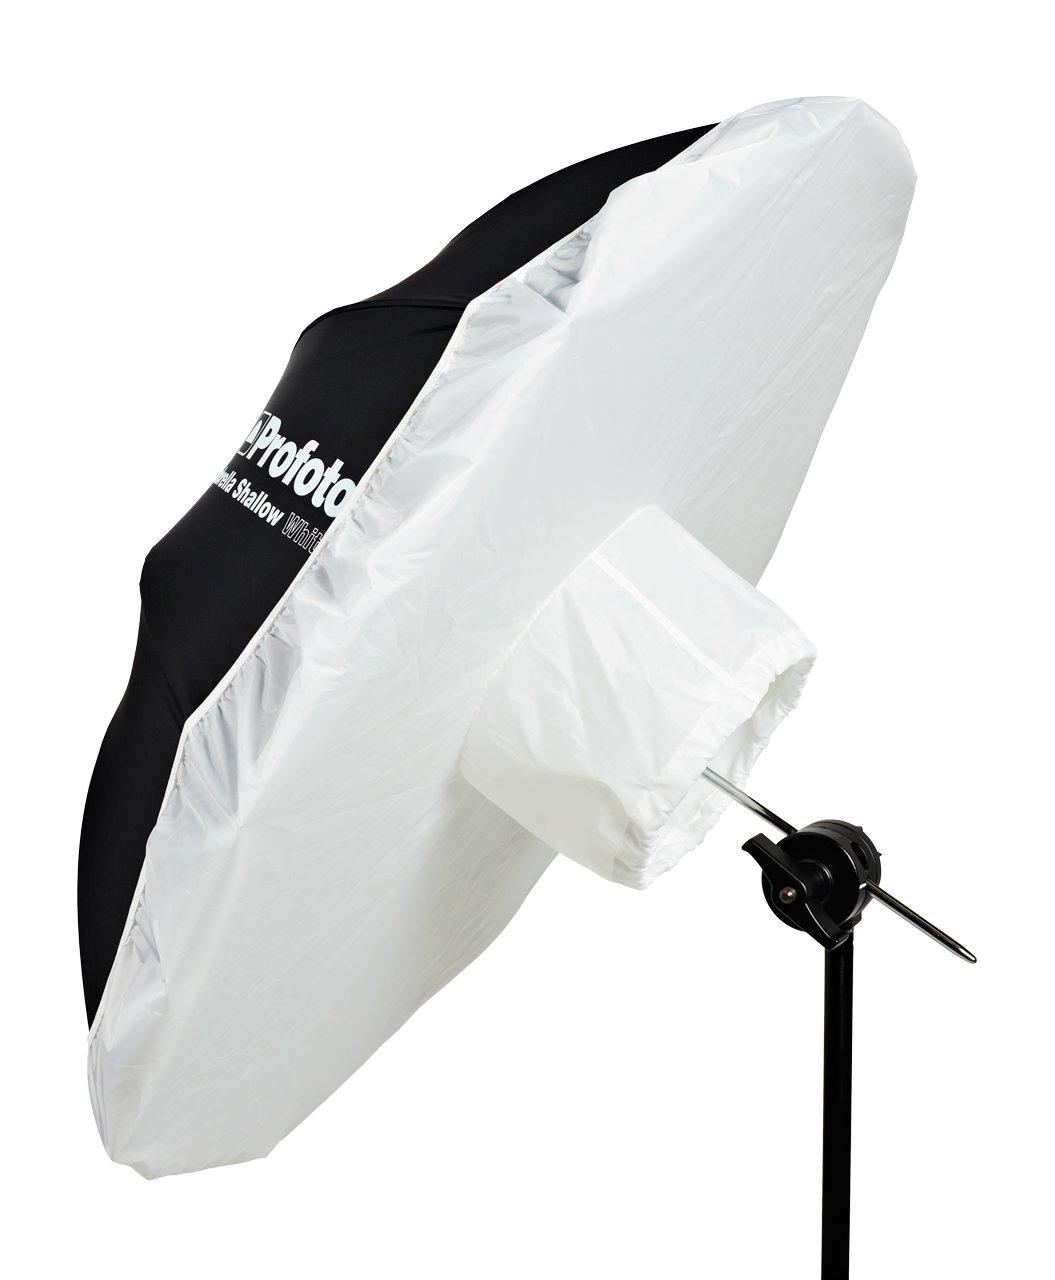 Profoto Umbrella Diffuser (Medium) 100991